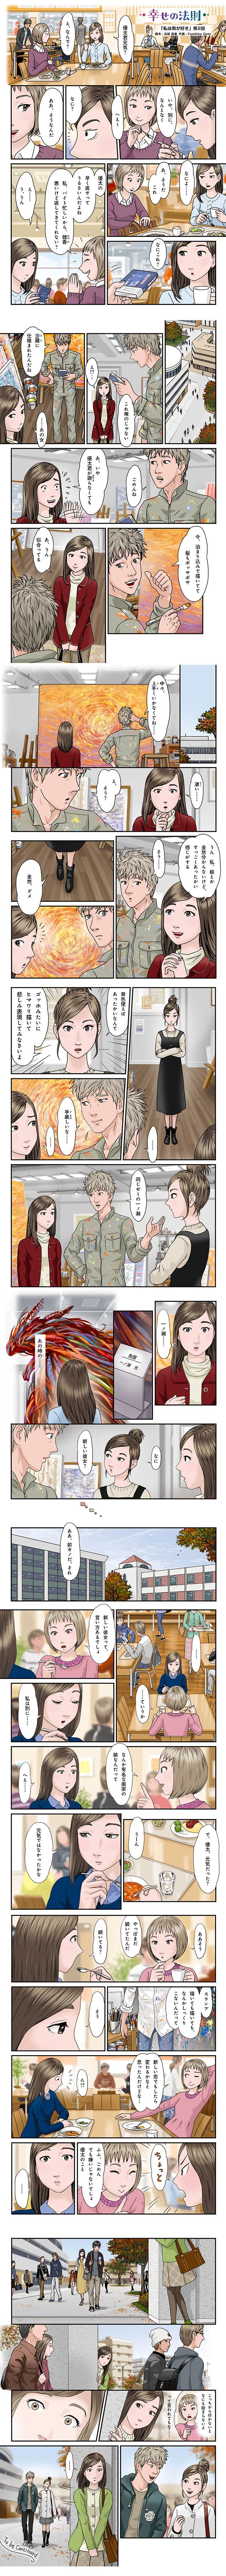 hidokei119_manga_all